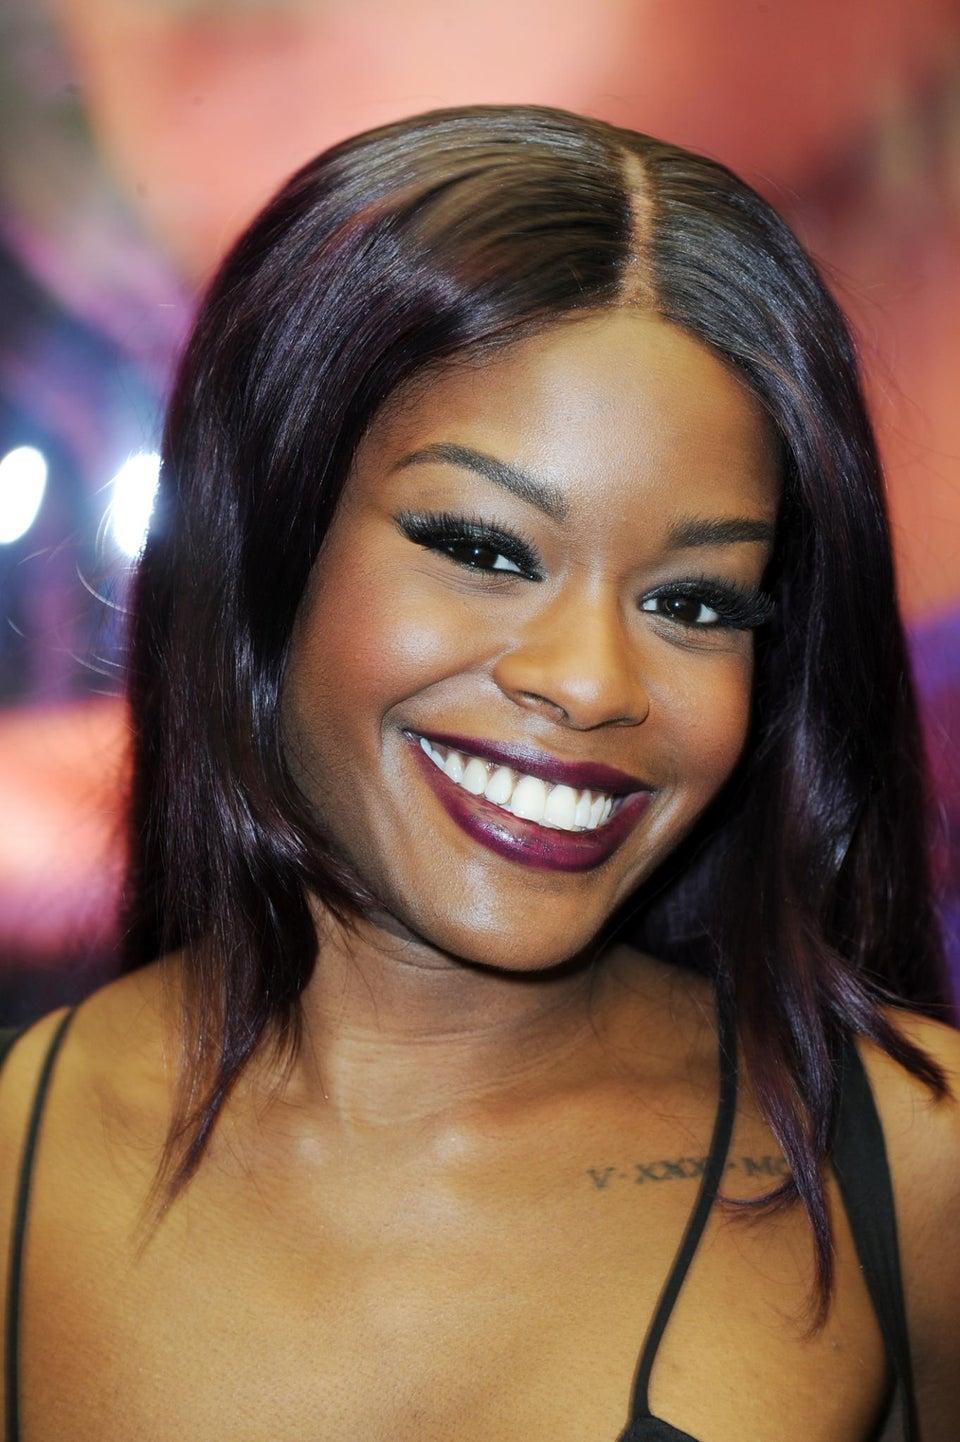 Twitter Briefly Suspends Azealia Banks, Everyone Celebrates